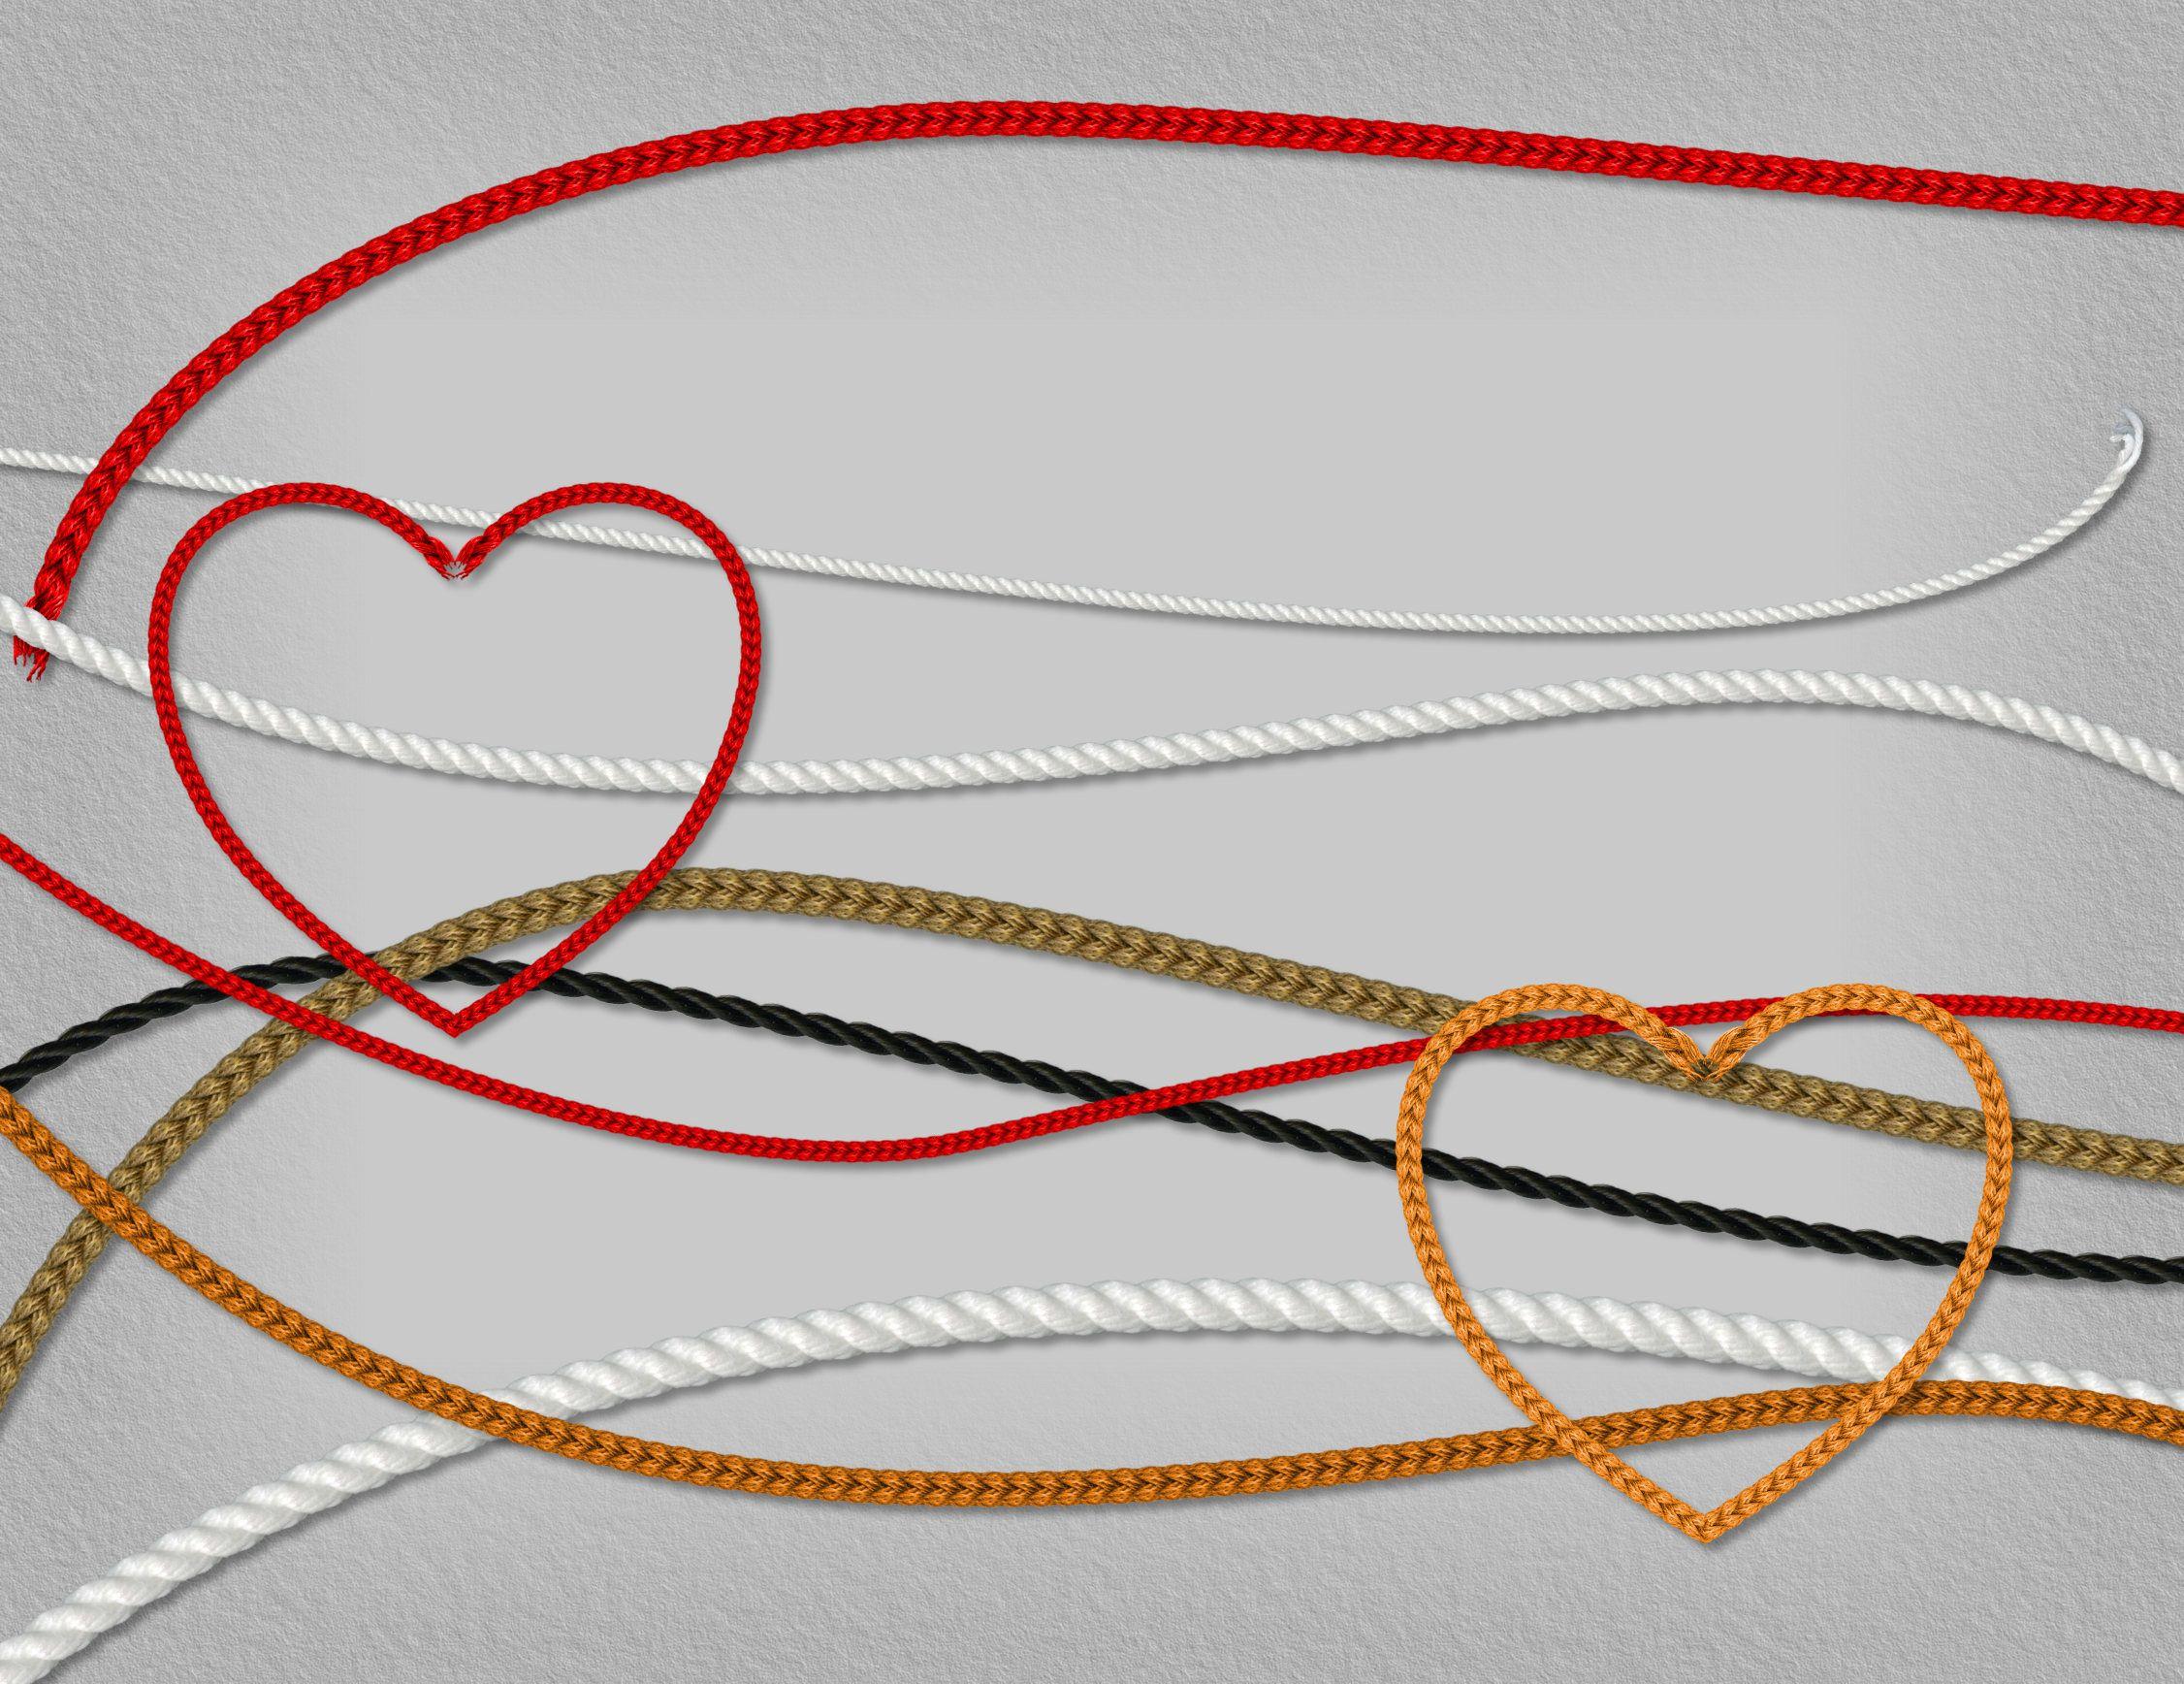 3D realistic decorative rope borders, plaited braiding, weaving ...